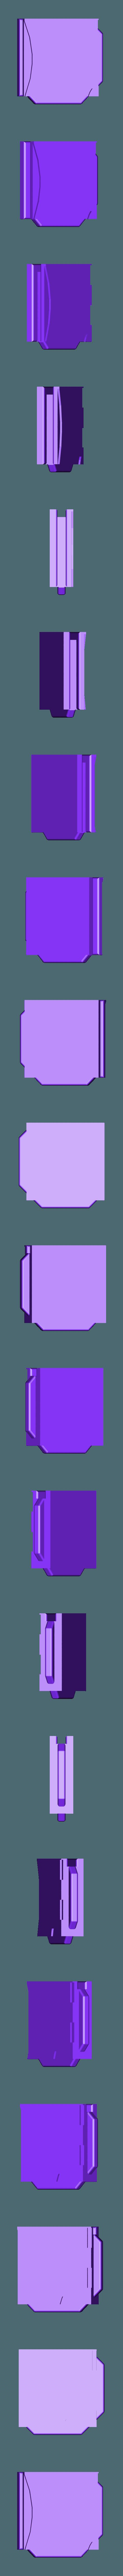 Piece - Part 17.stl Download free STL file Taquin CULTS / Sliding Puzzle • 3D print model, Valelab3D